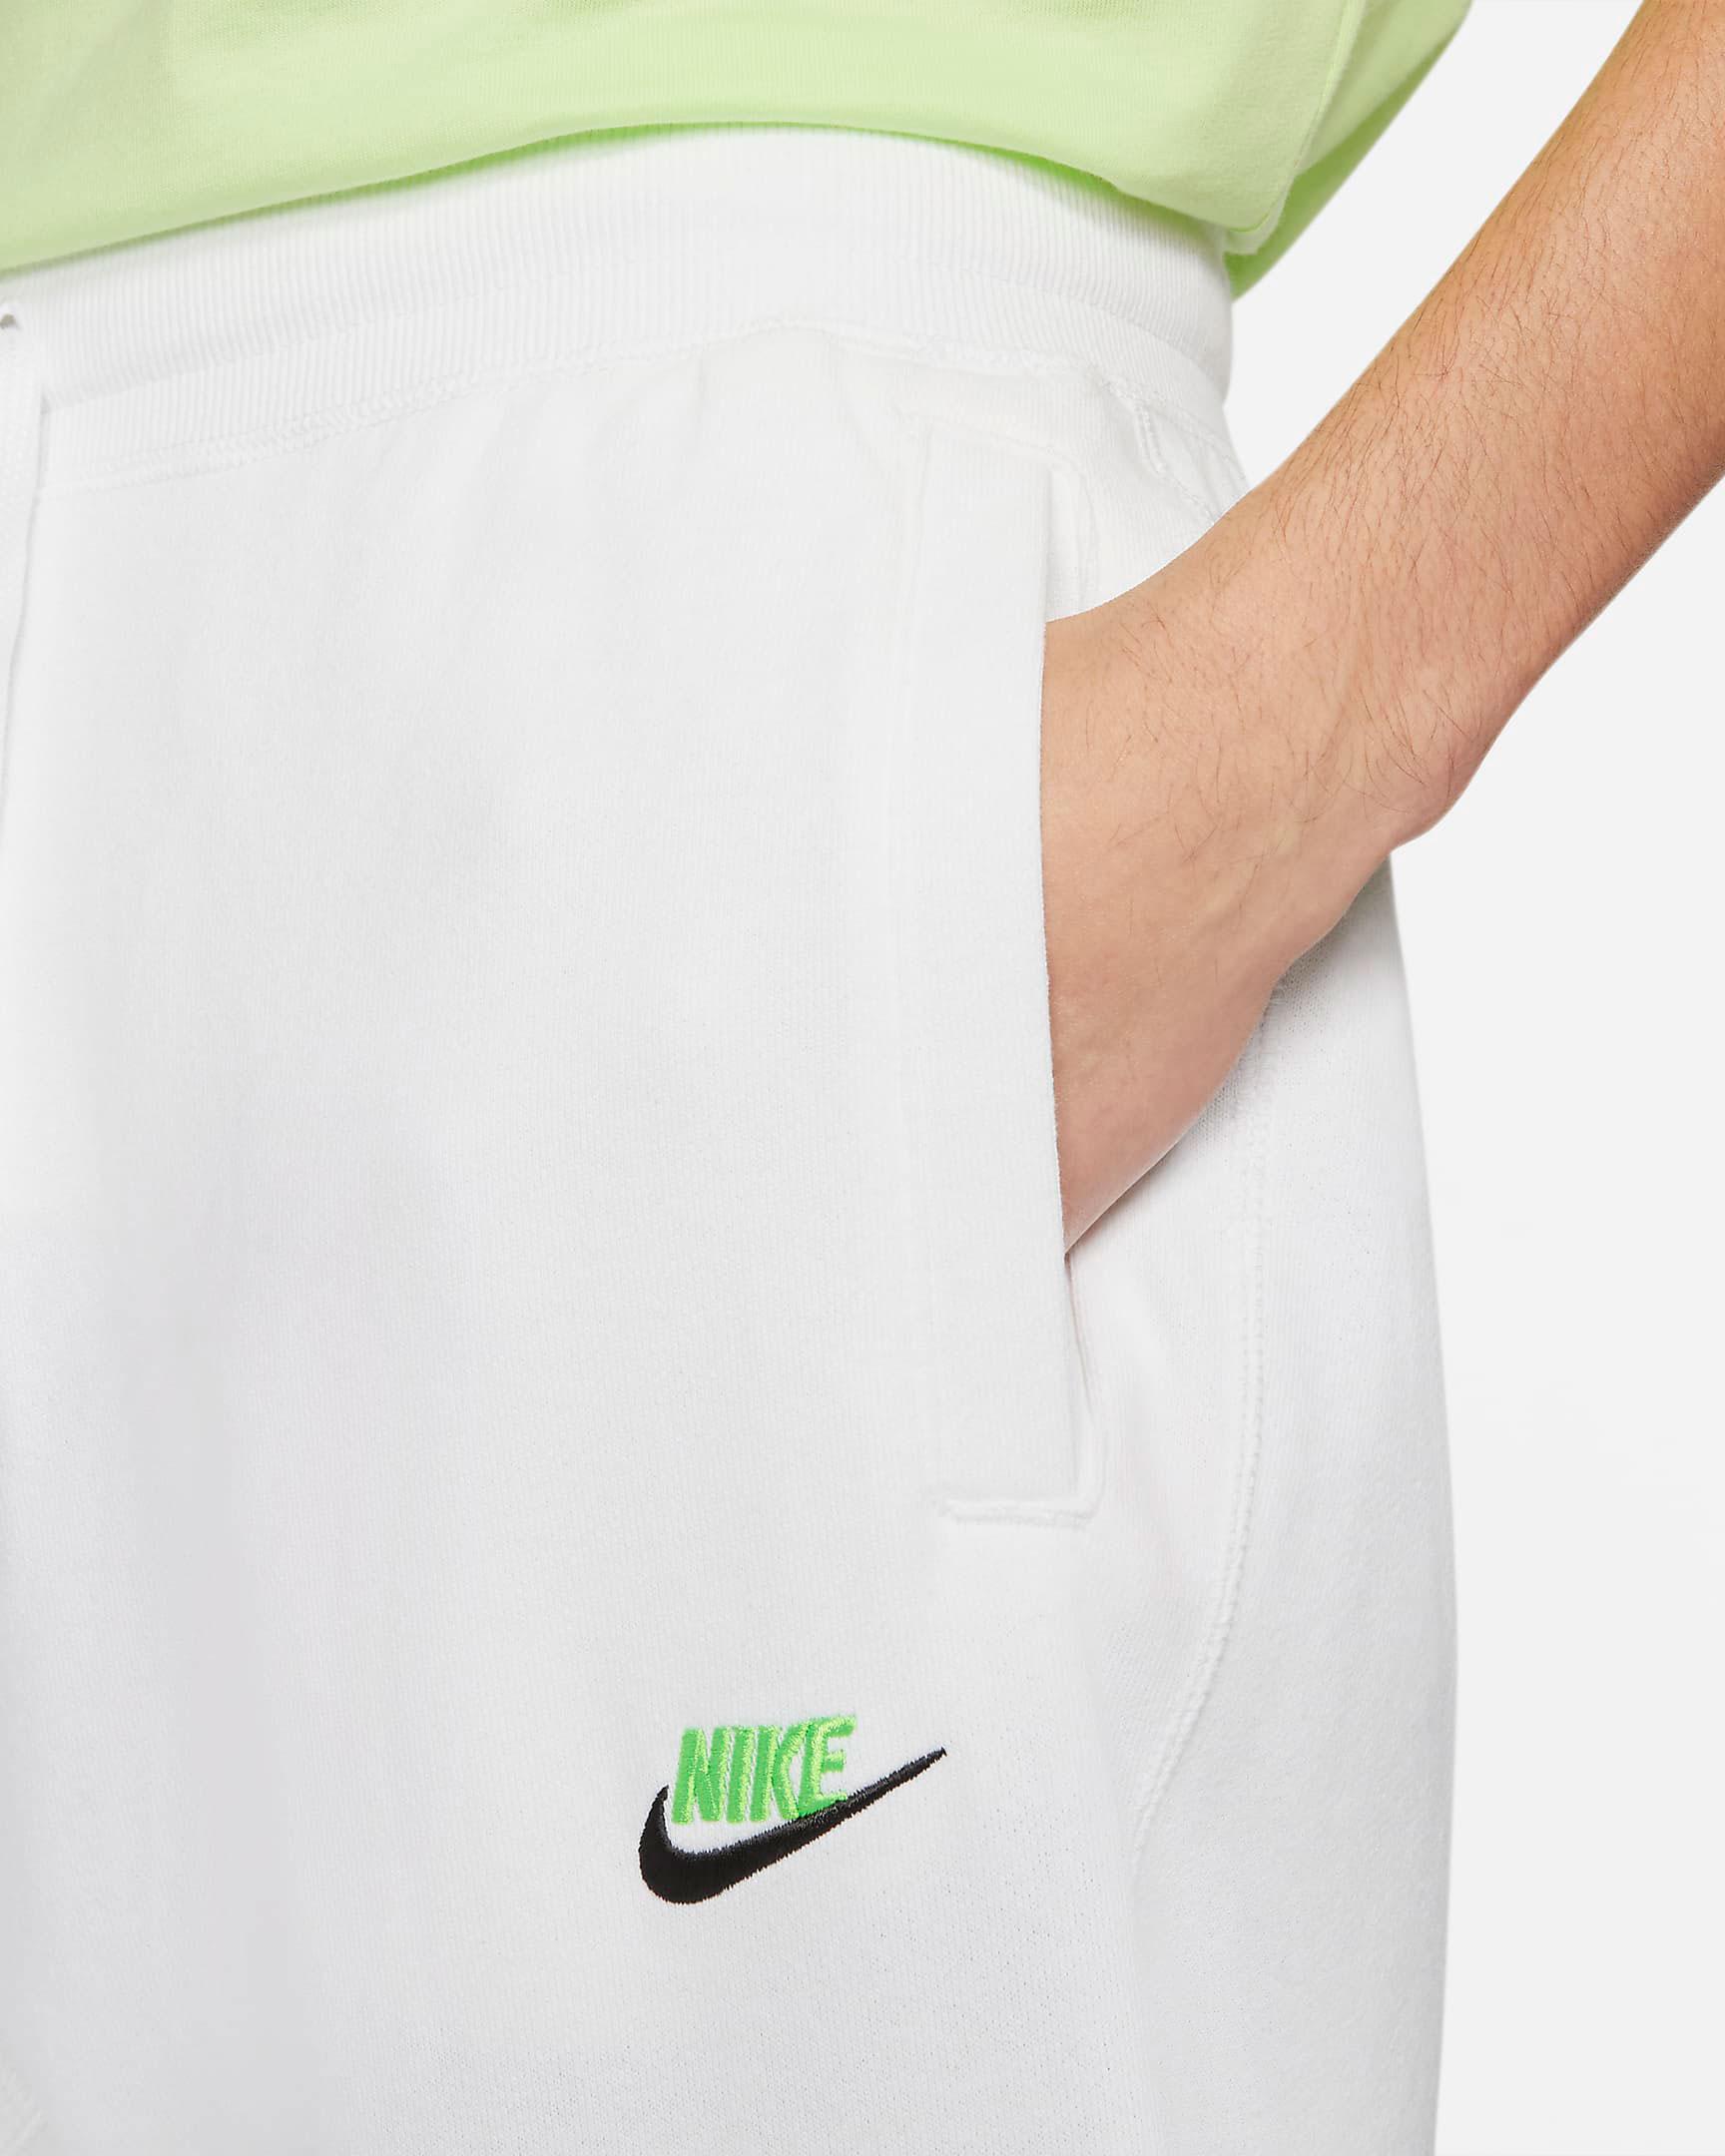 nike-club-fleece-jogger-pants-white-lime-green-black-1